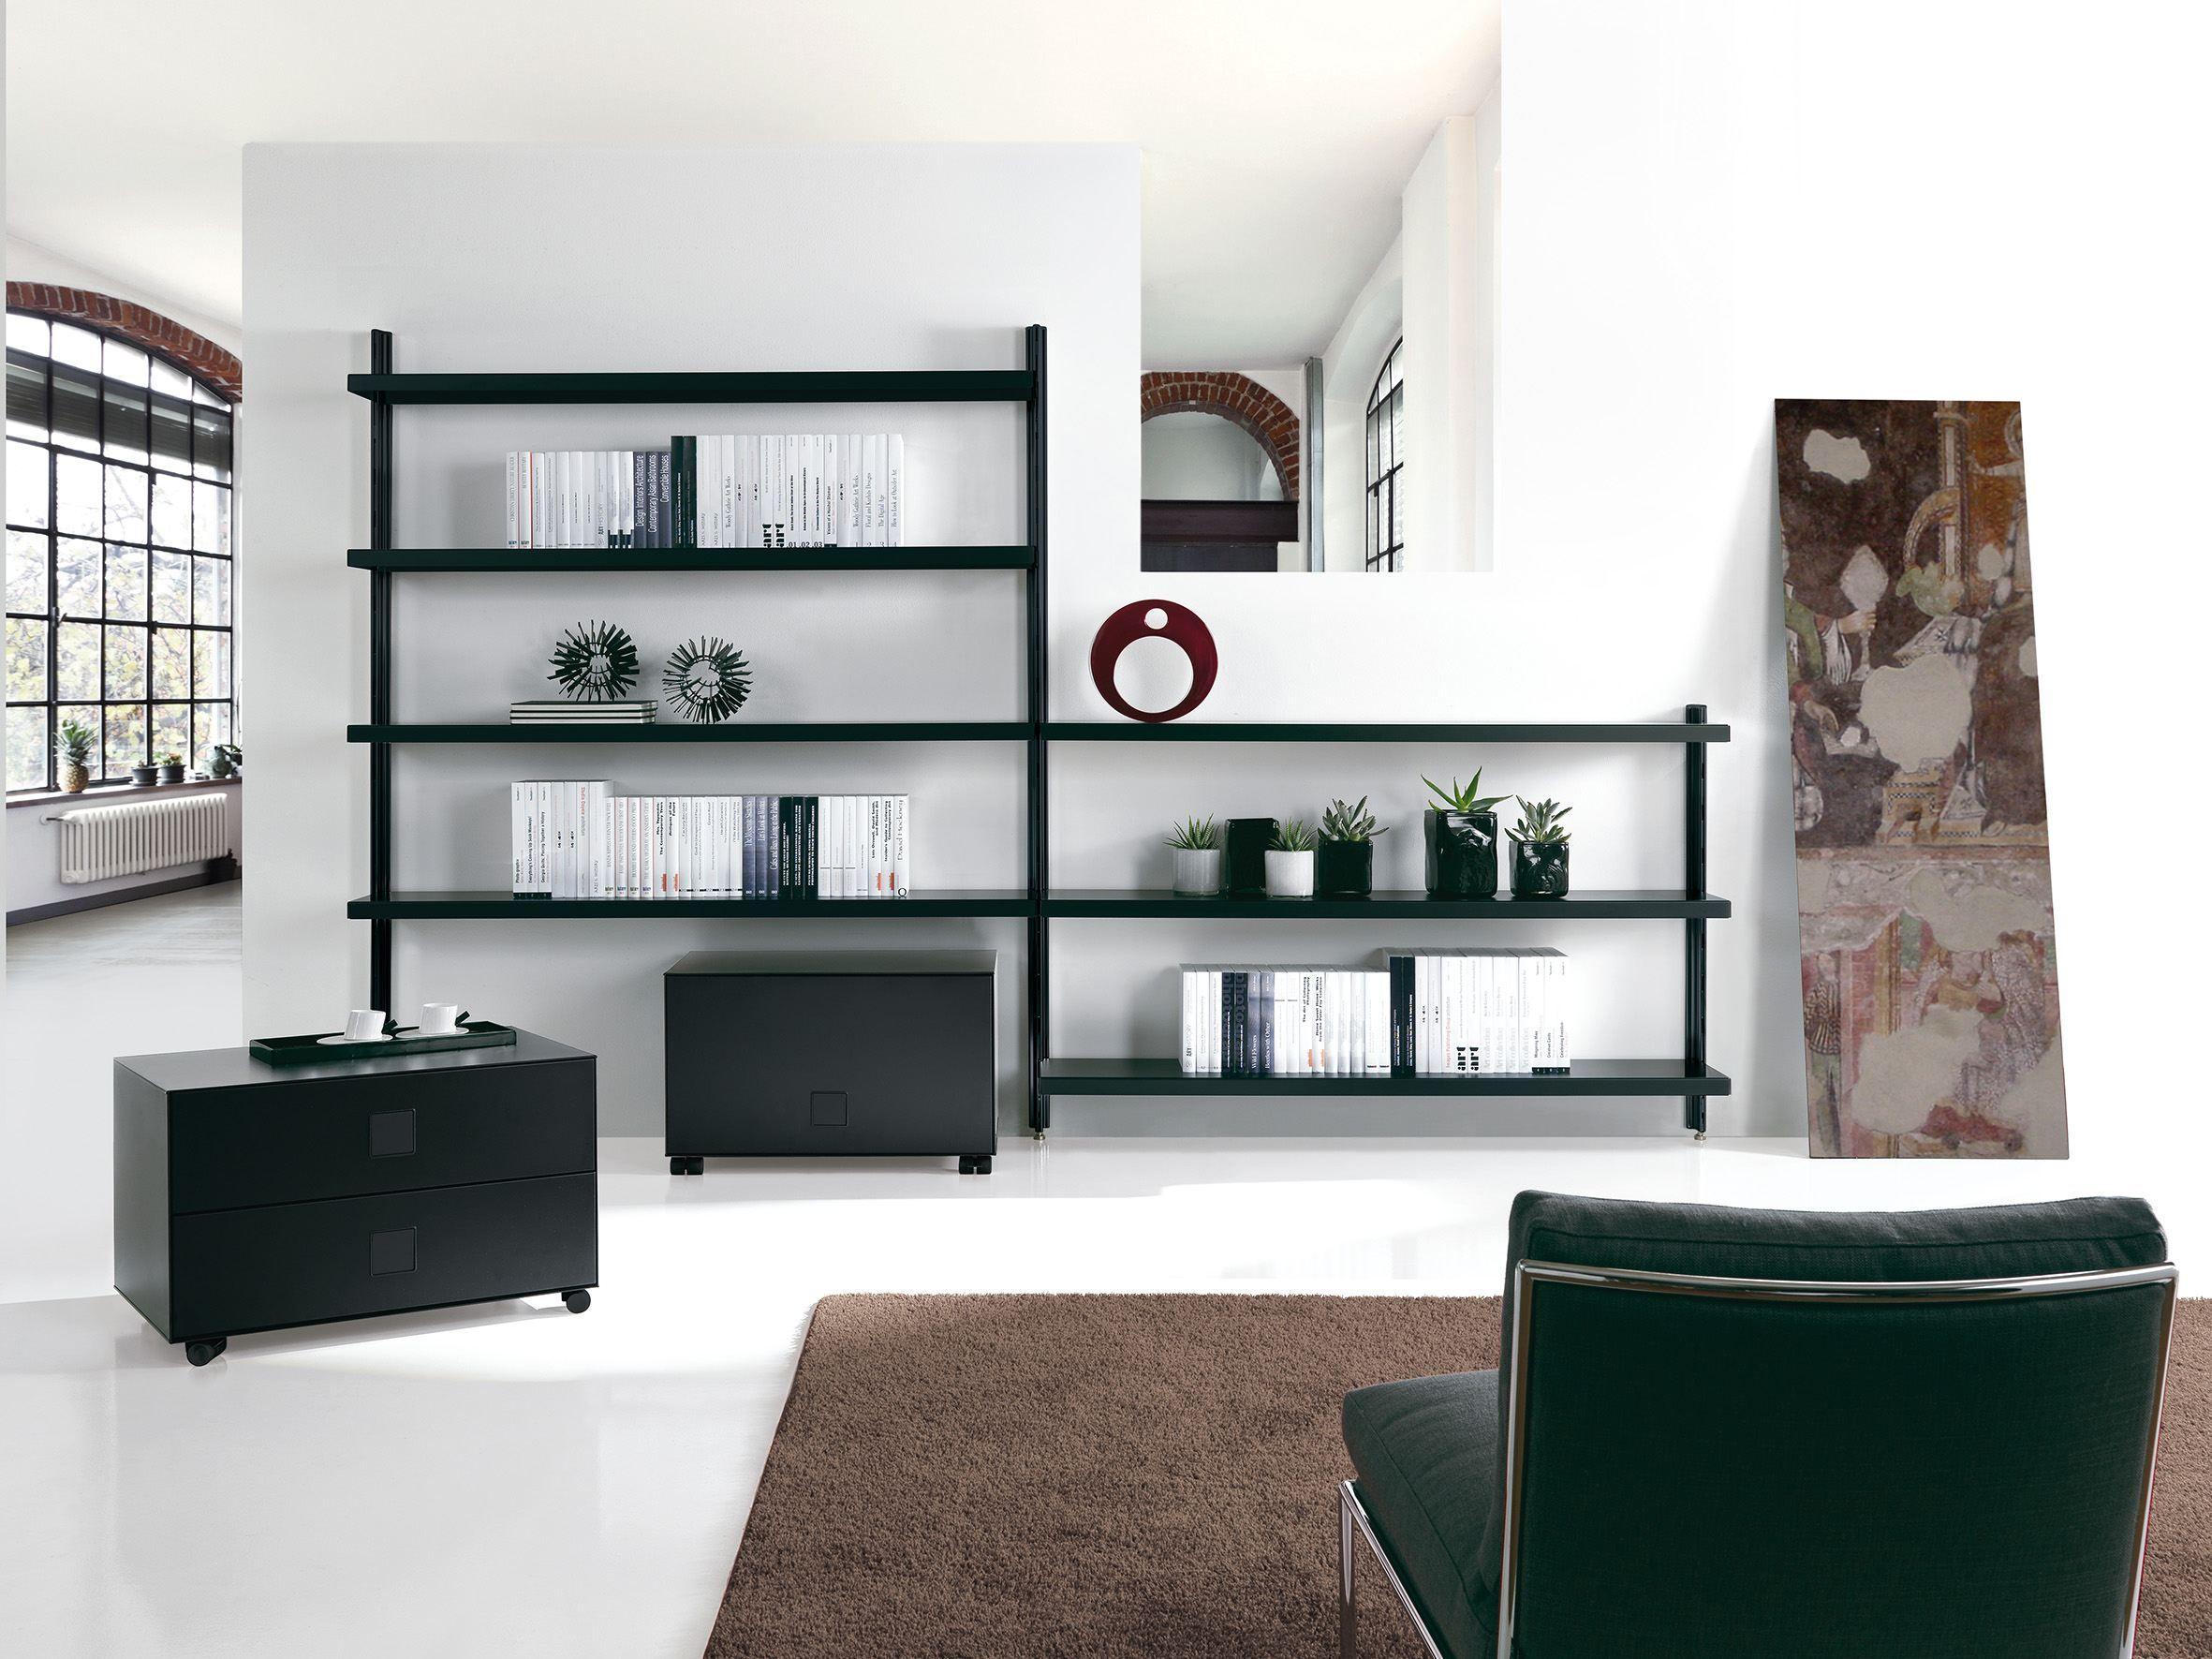 Librerie a parete | Archiproducts